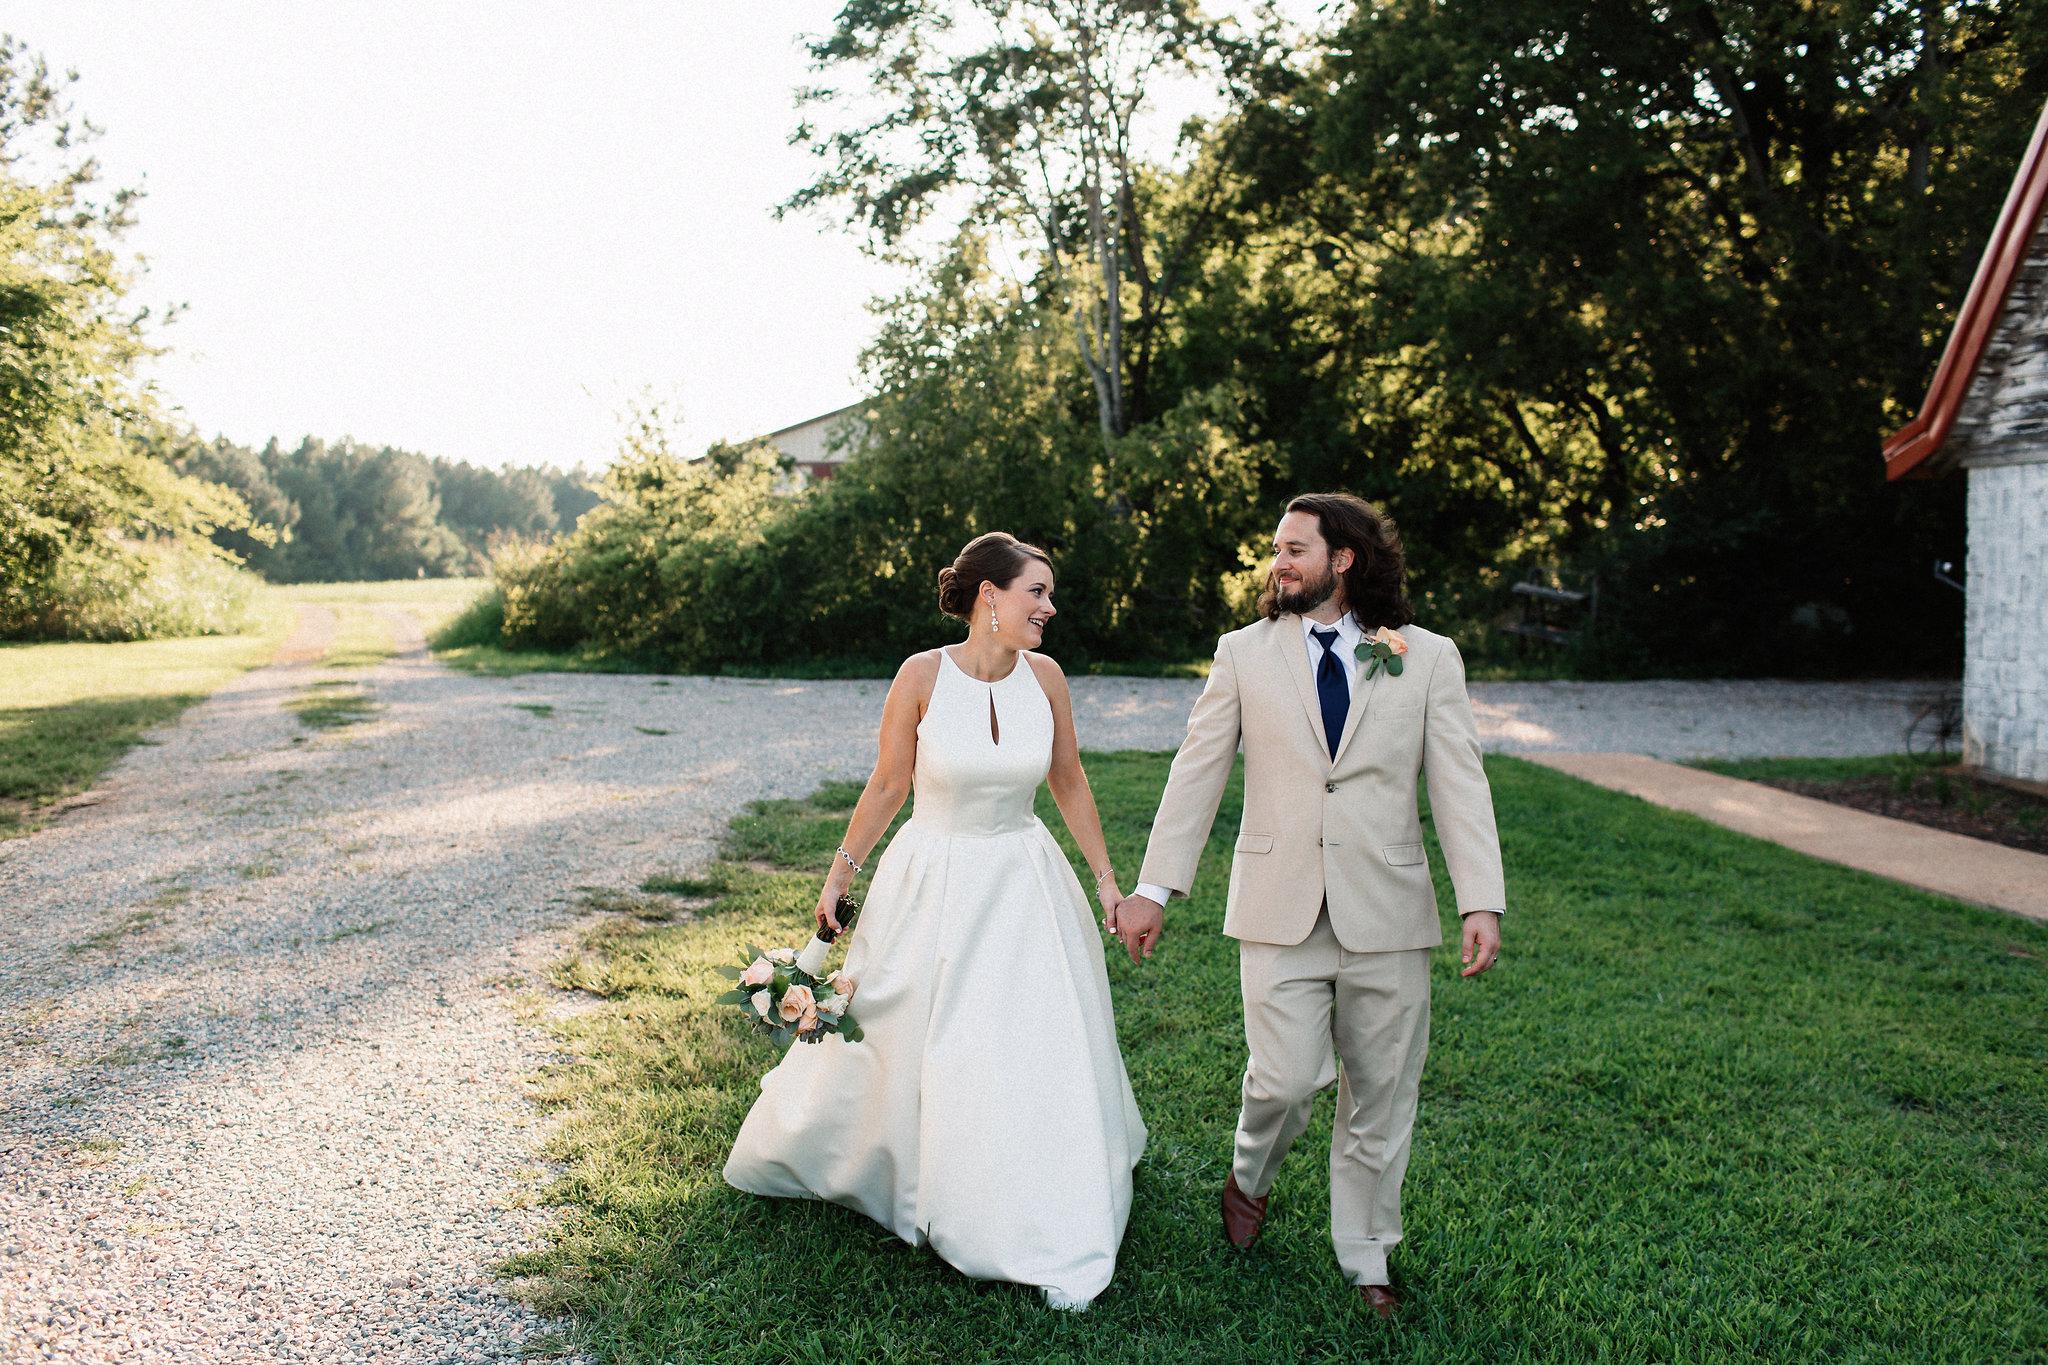 Lindsay&JoshMarried2017-08-31at19.08.10PM190.jpg